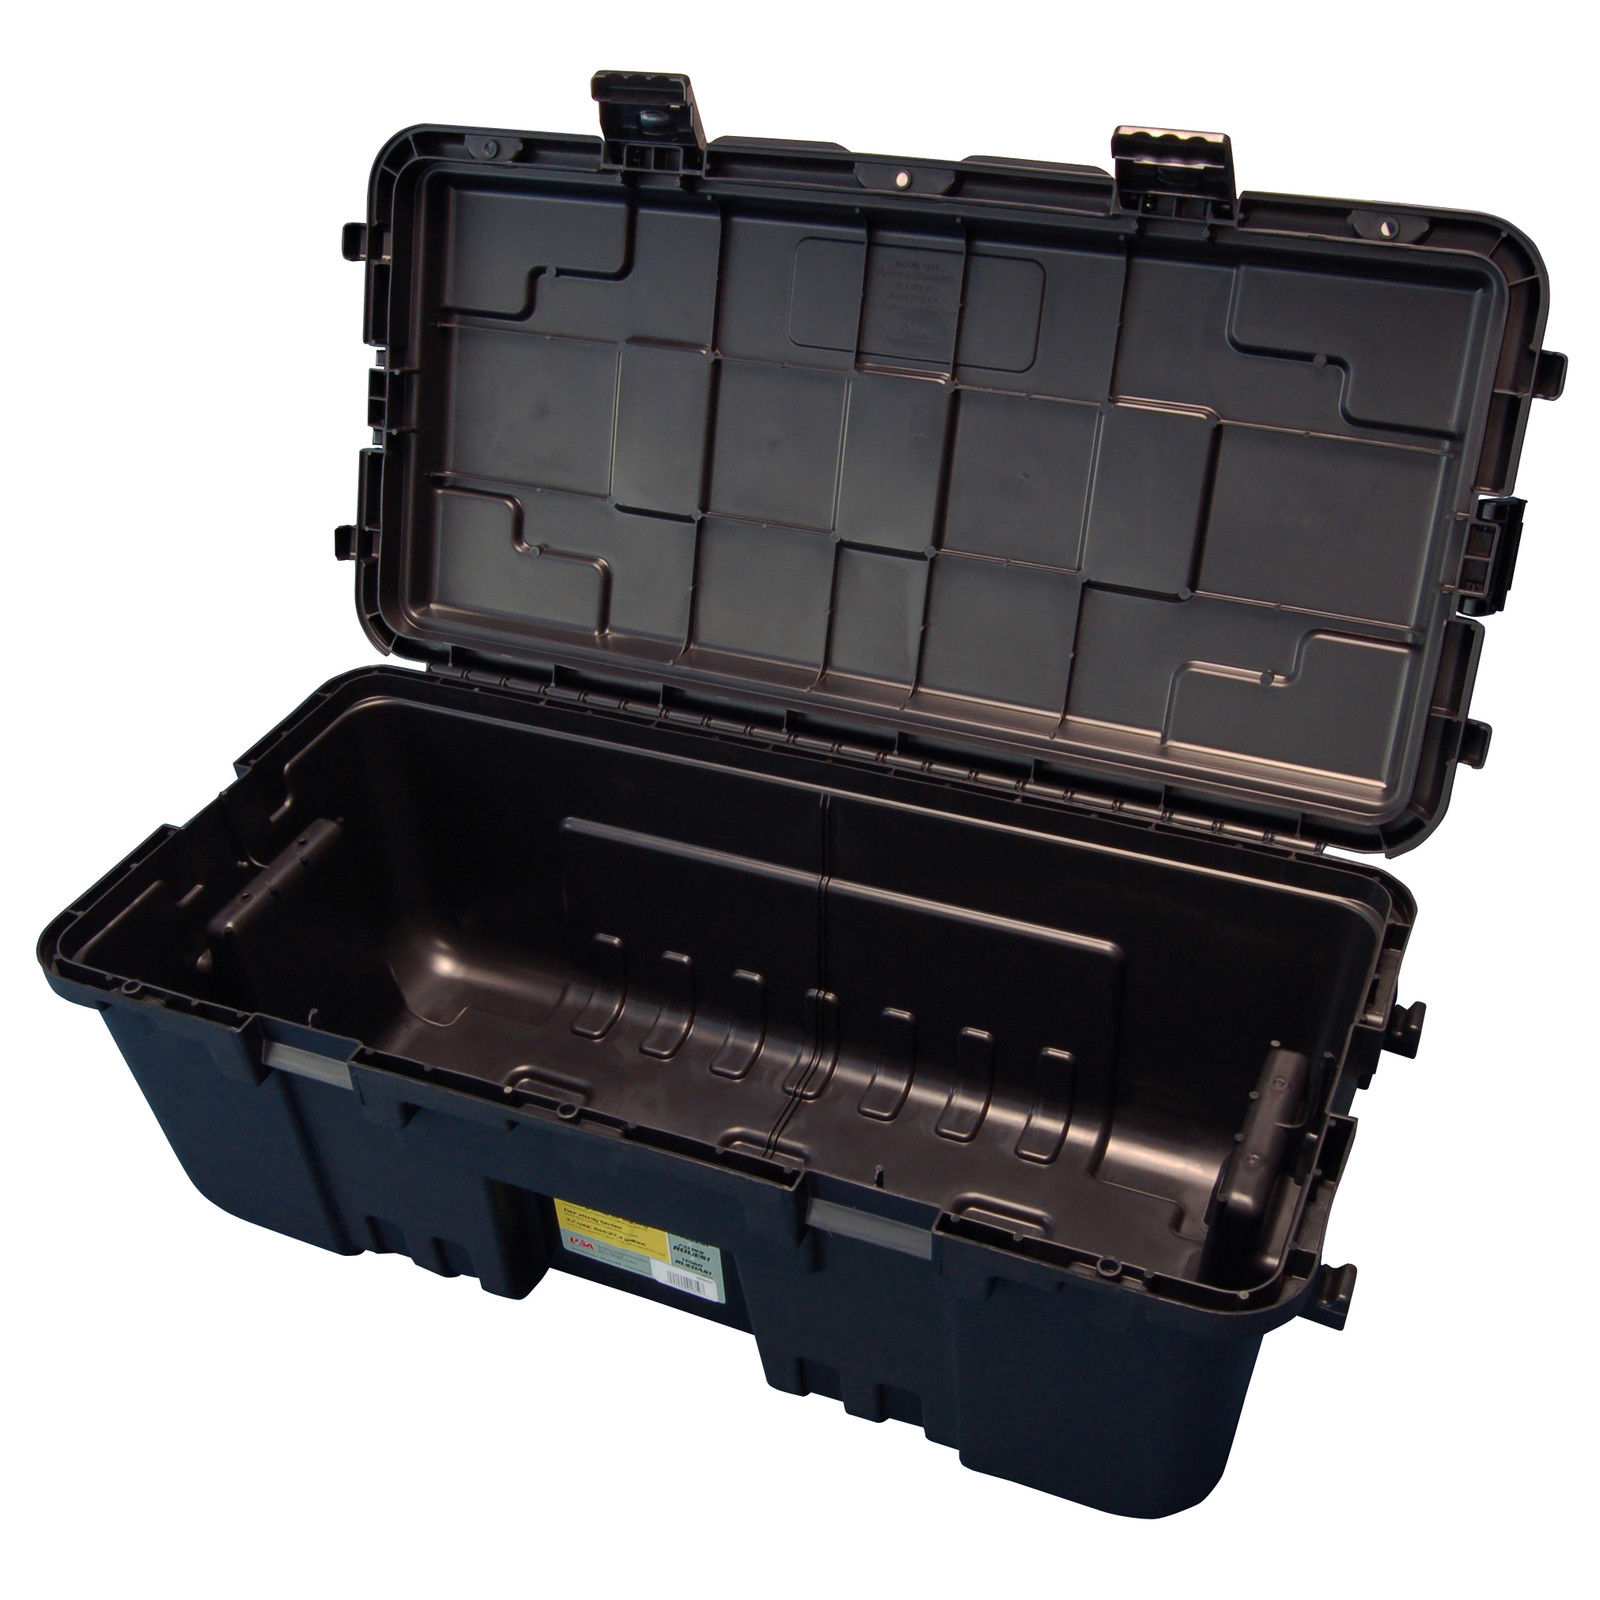 Plano military storage trunk black - Footlockers storage ...